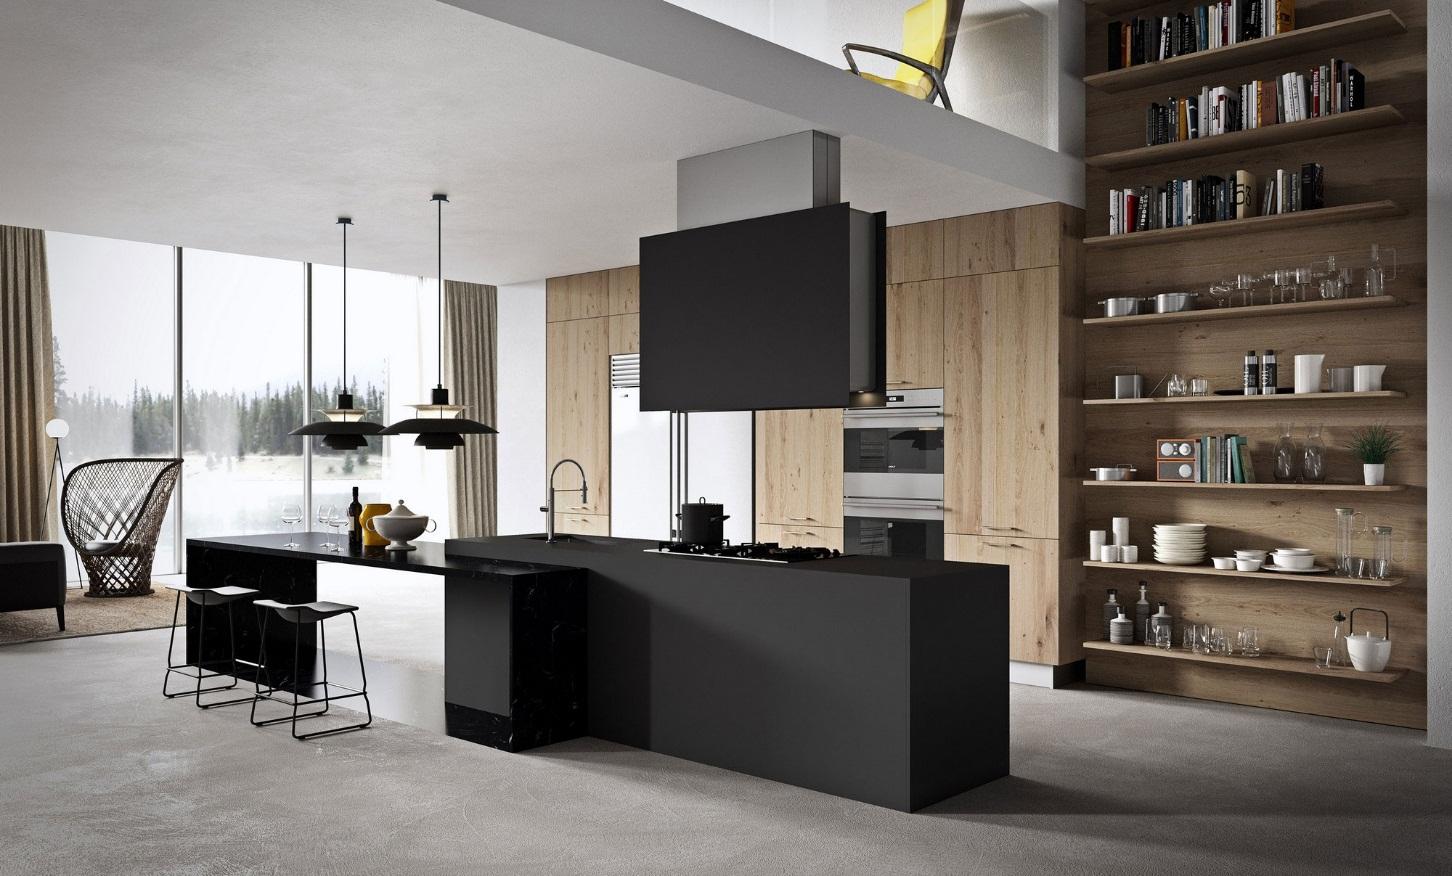 طراحی آشپزخانه مدرن 18